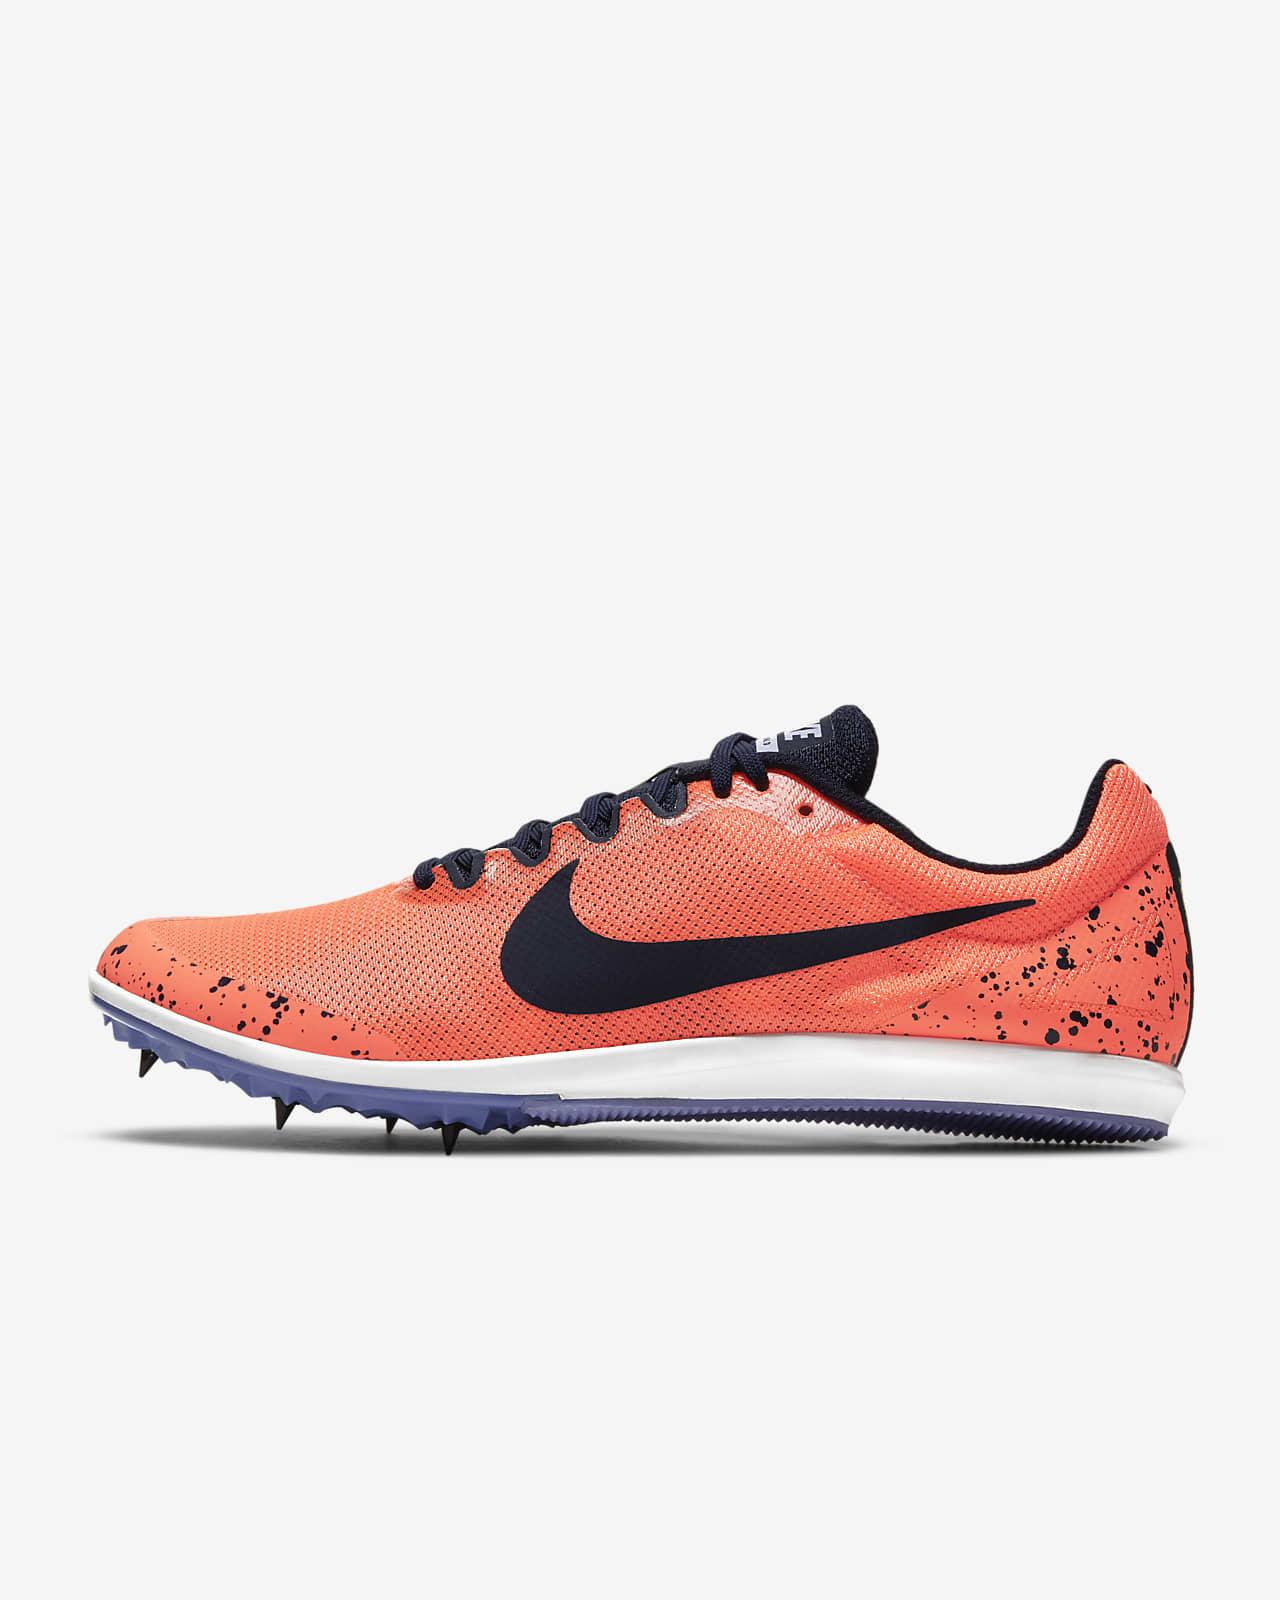 Nike Zoom Rival D 10 piggsko til distanseløping